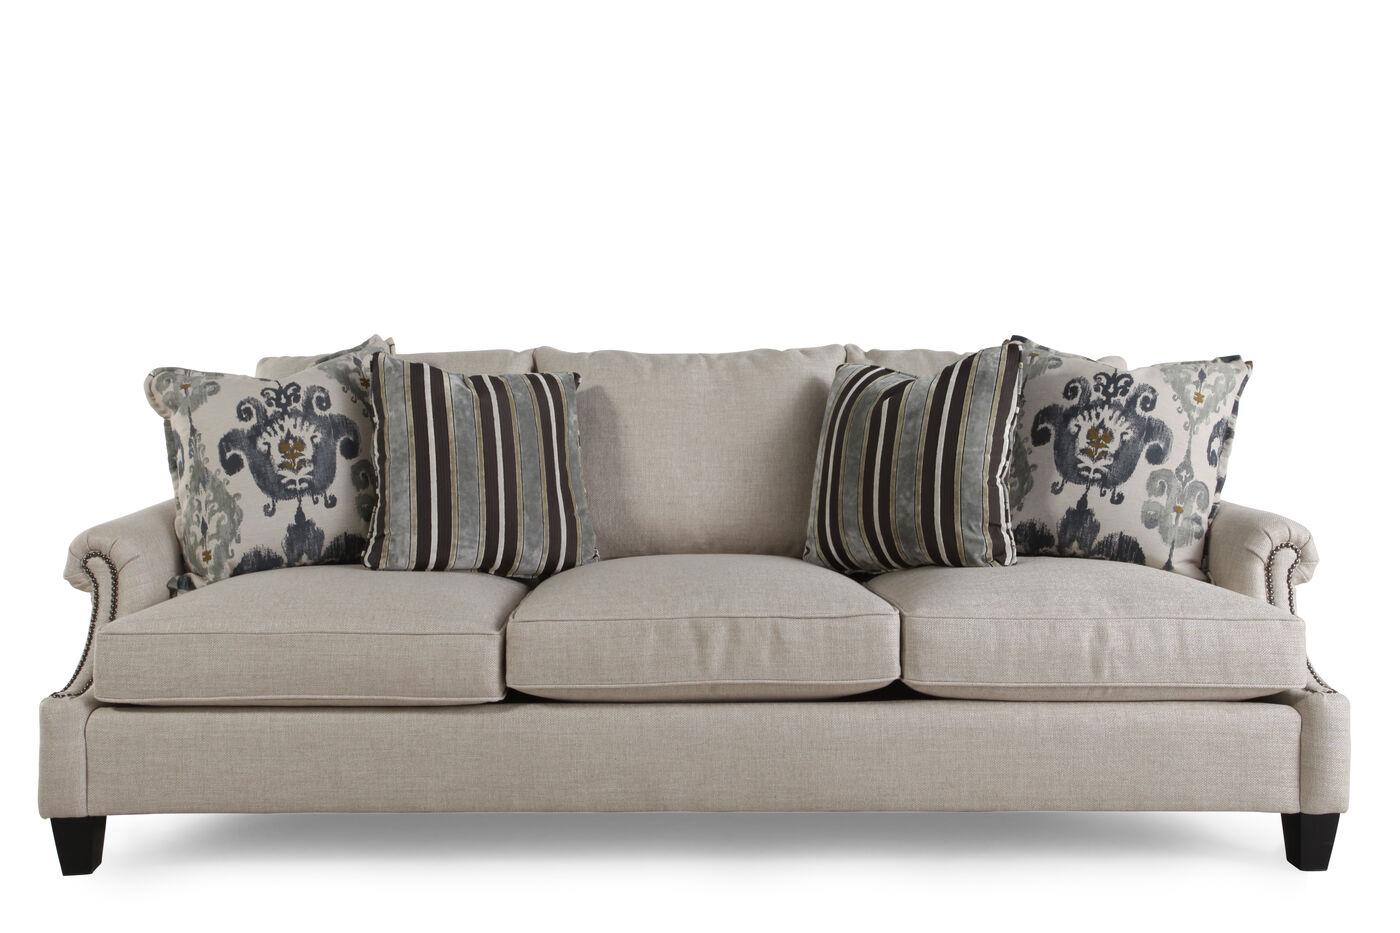 White Sofa from Bernhardt